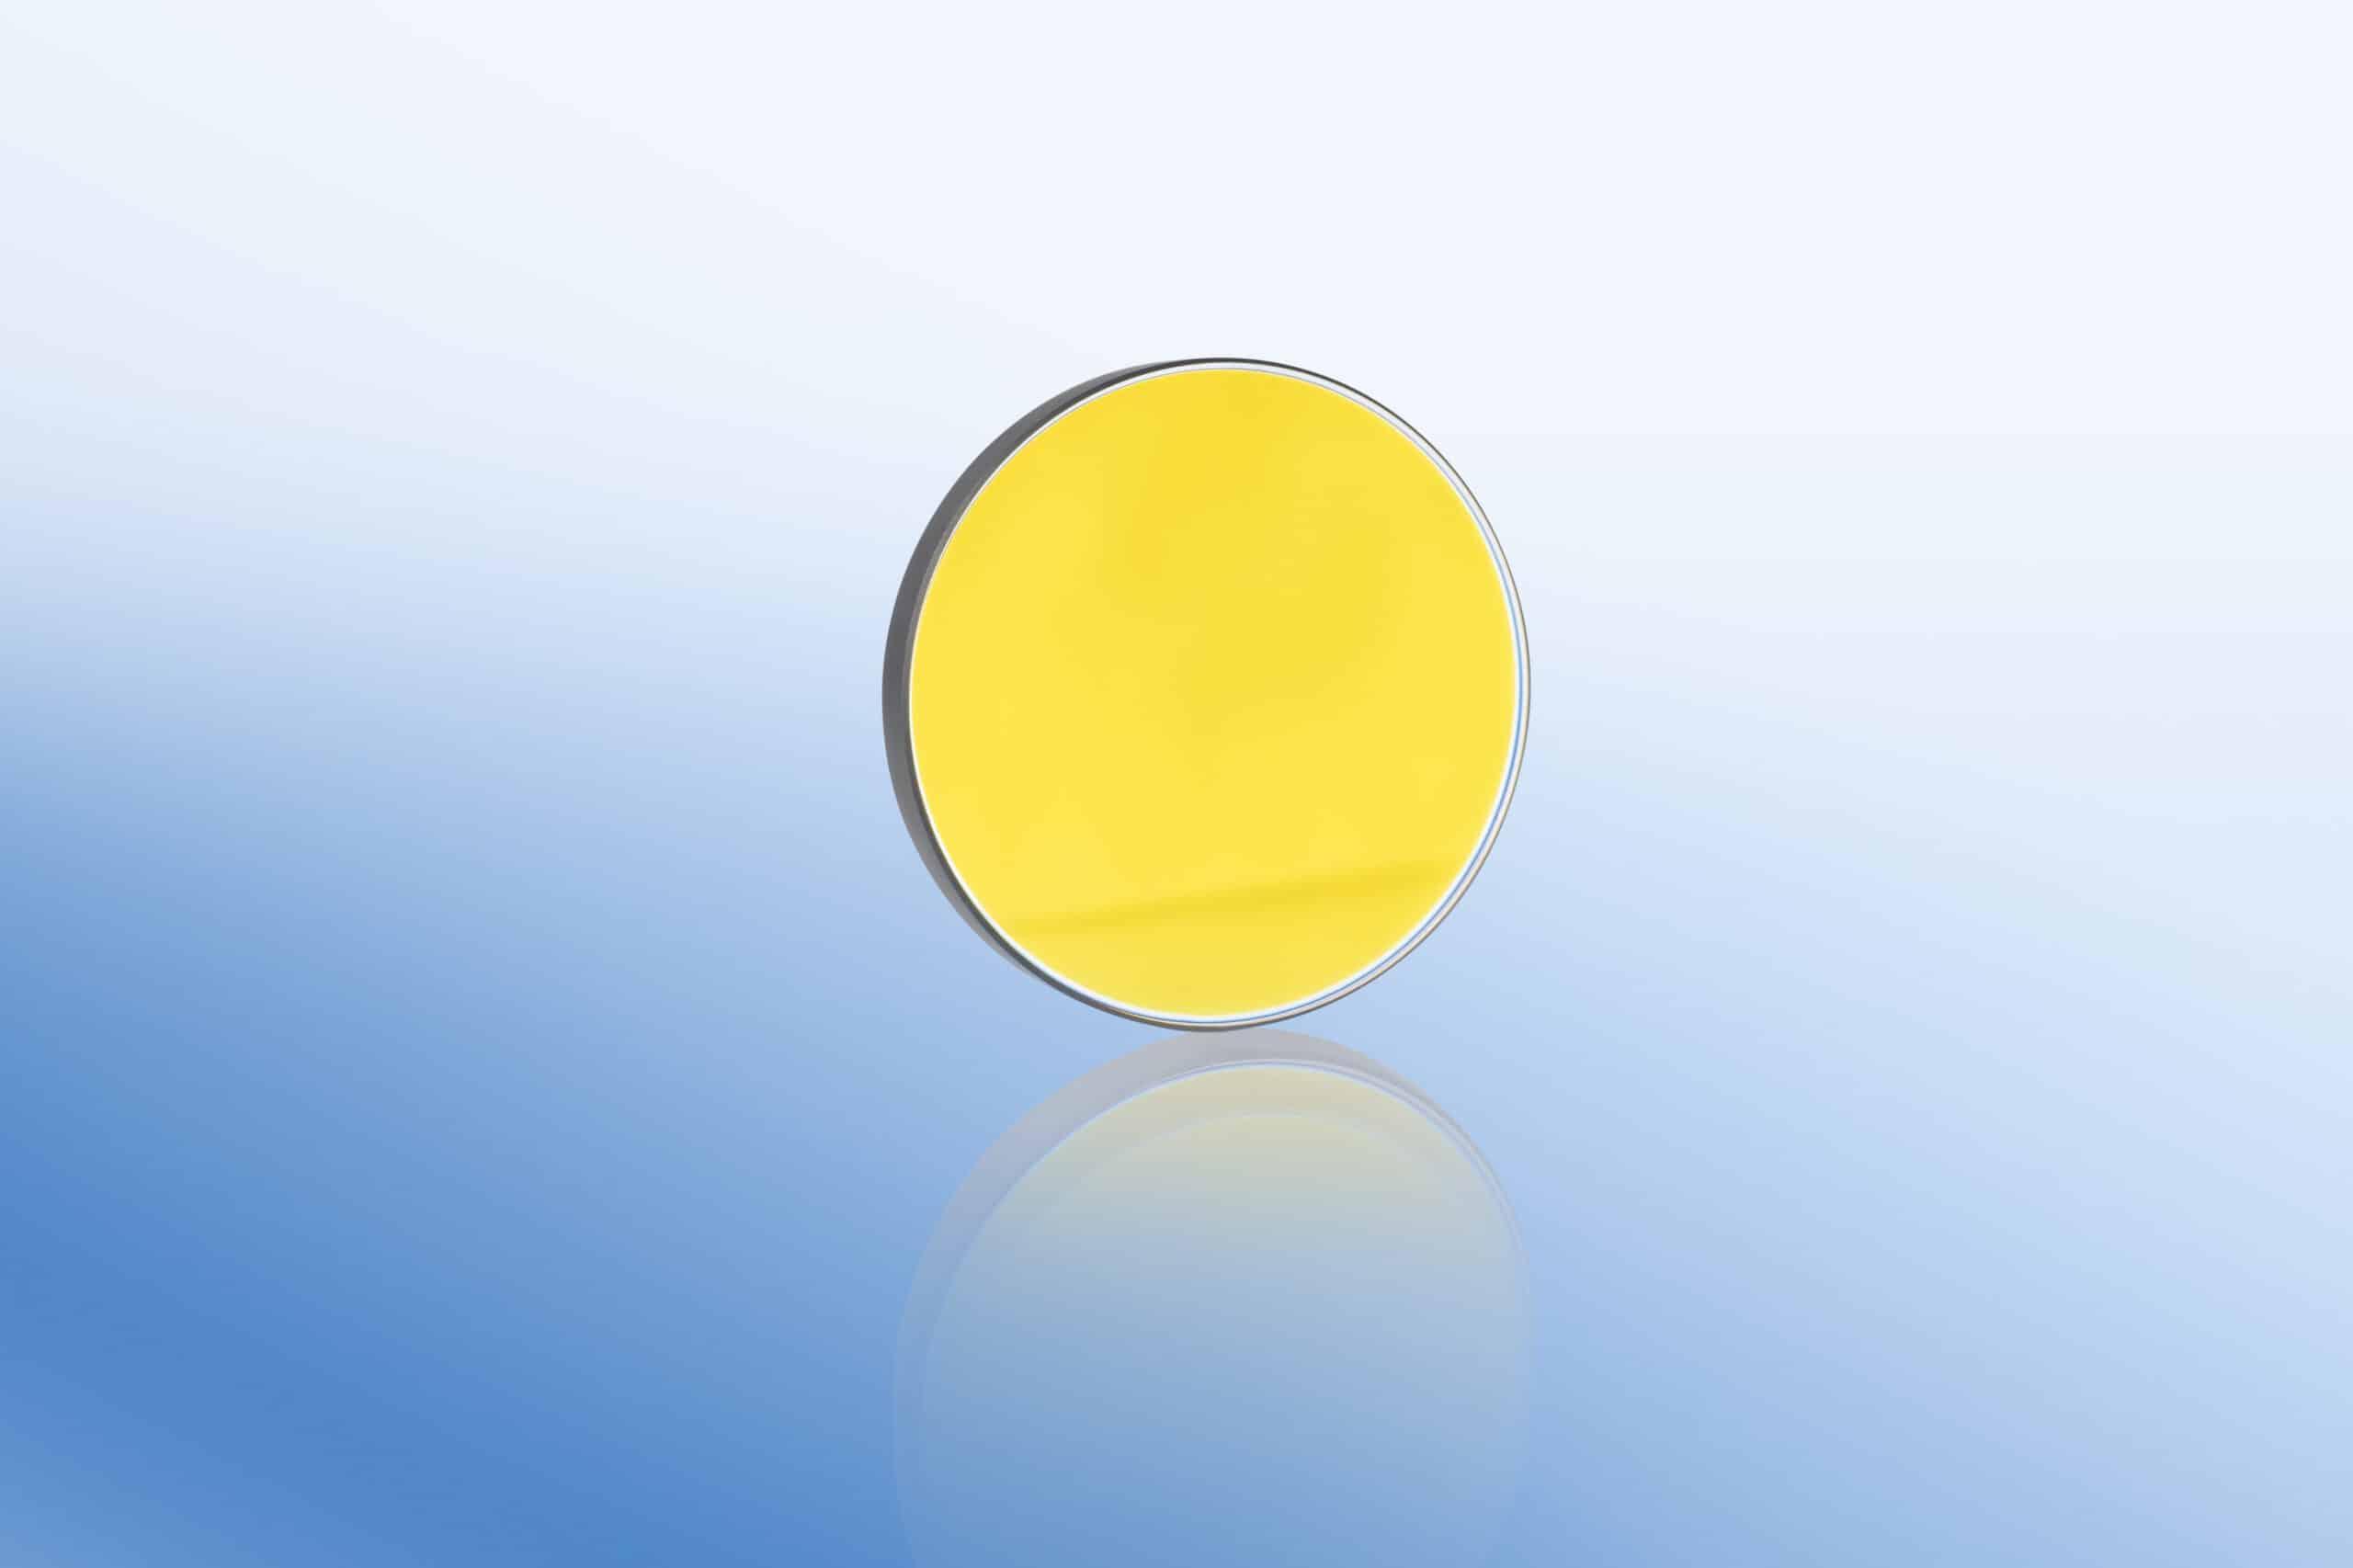 Laseroptik Goldspiegel